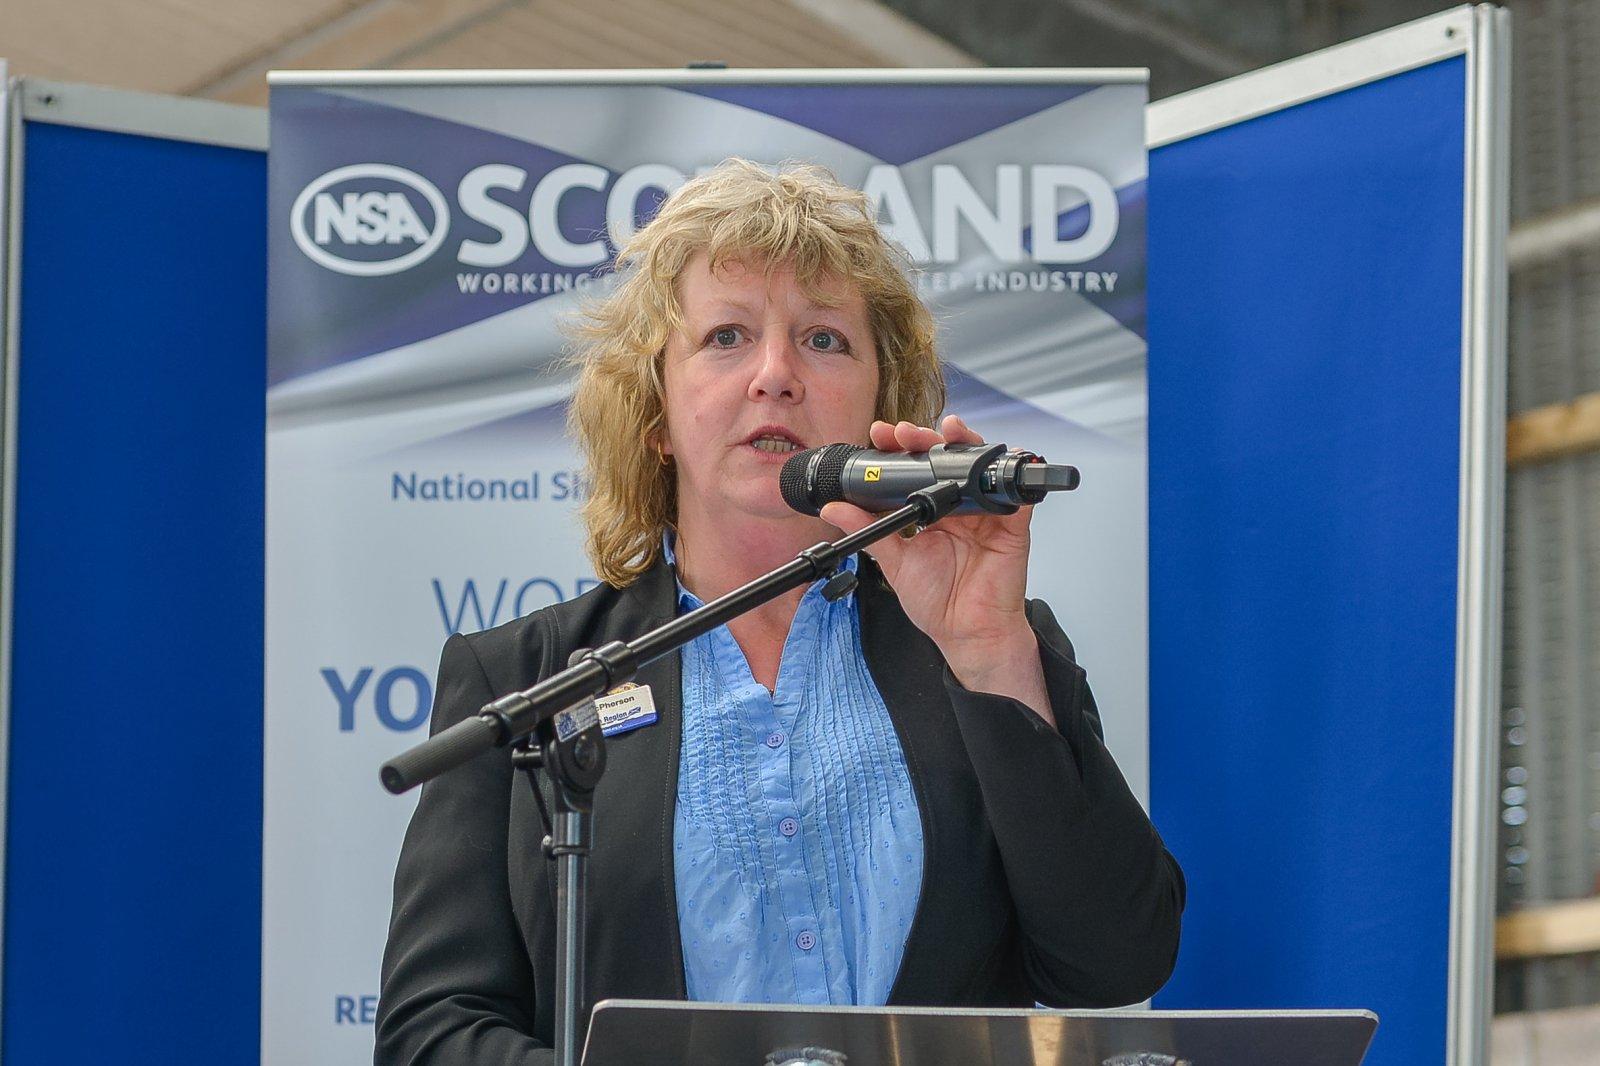 Sybil Macpherson, NSA Scottish Region Chairman, welcomes visitors to NSA Scot Sheep 2016, held at Blythbank Farm, West Linton, Peeblesshire.